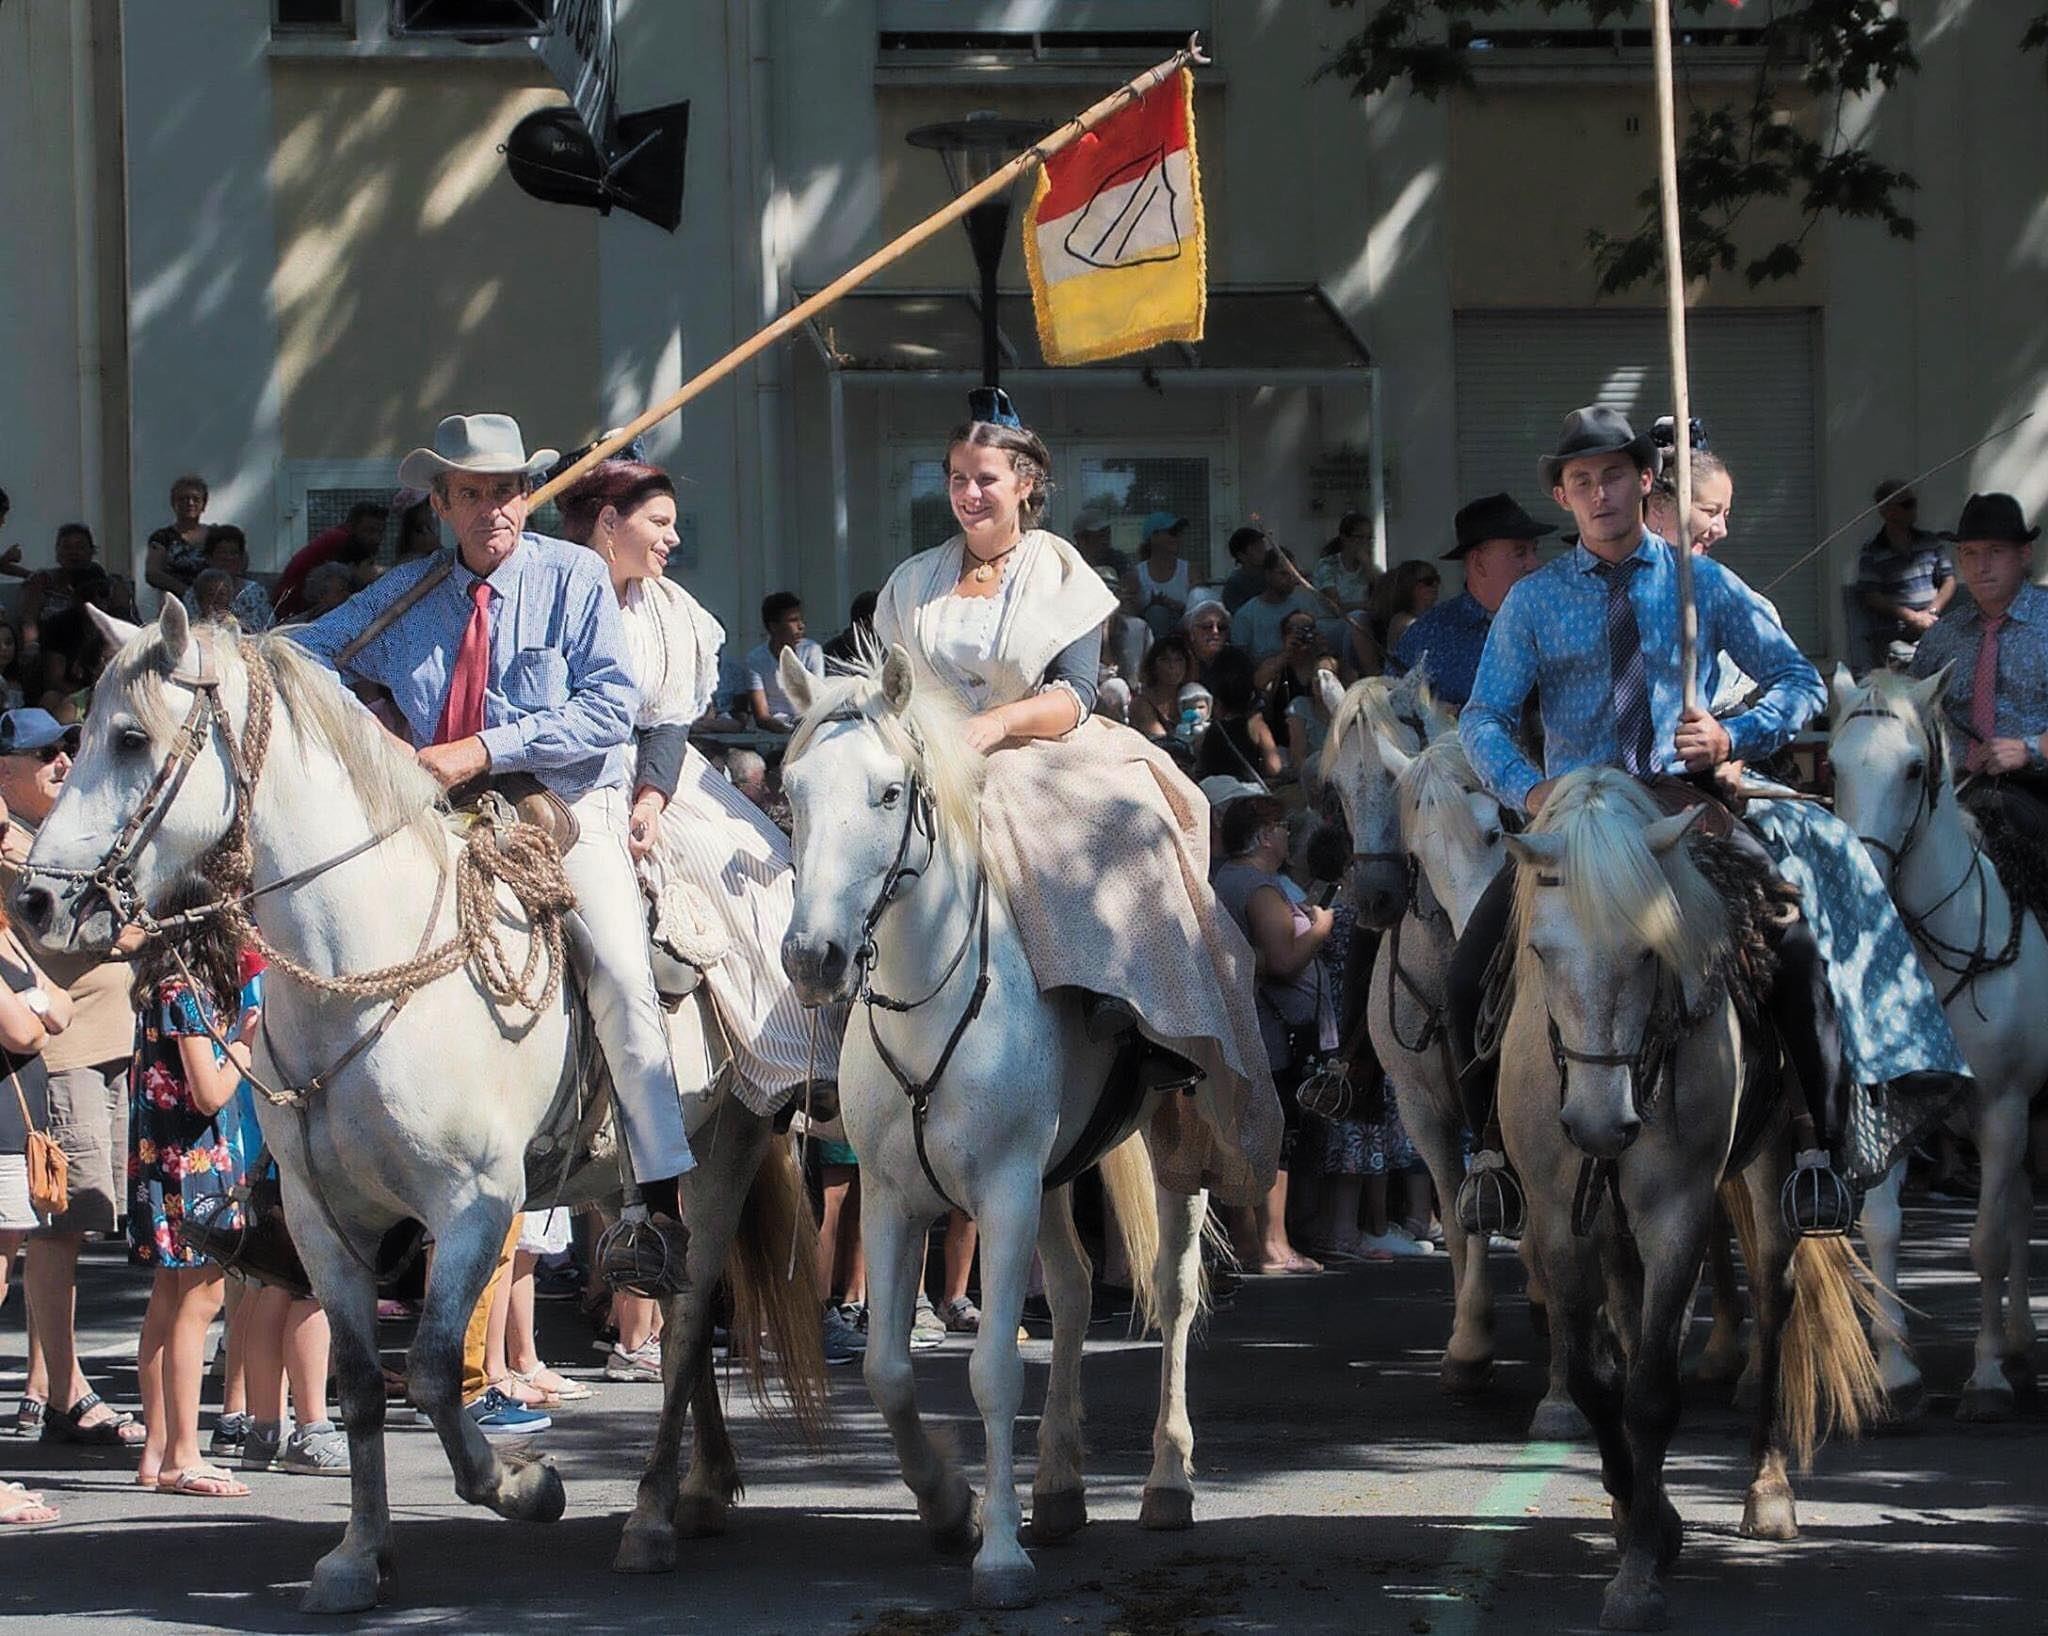 Défilé cheval Manade Chaballier arlésienne manadier tradition camarguaises camargue gardian